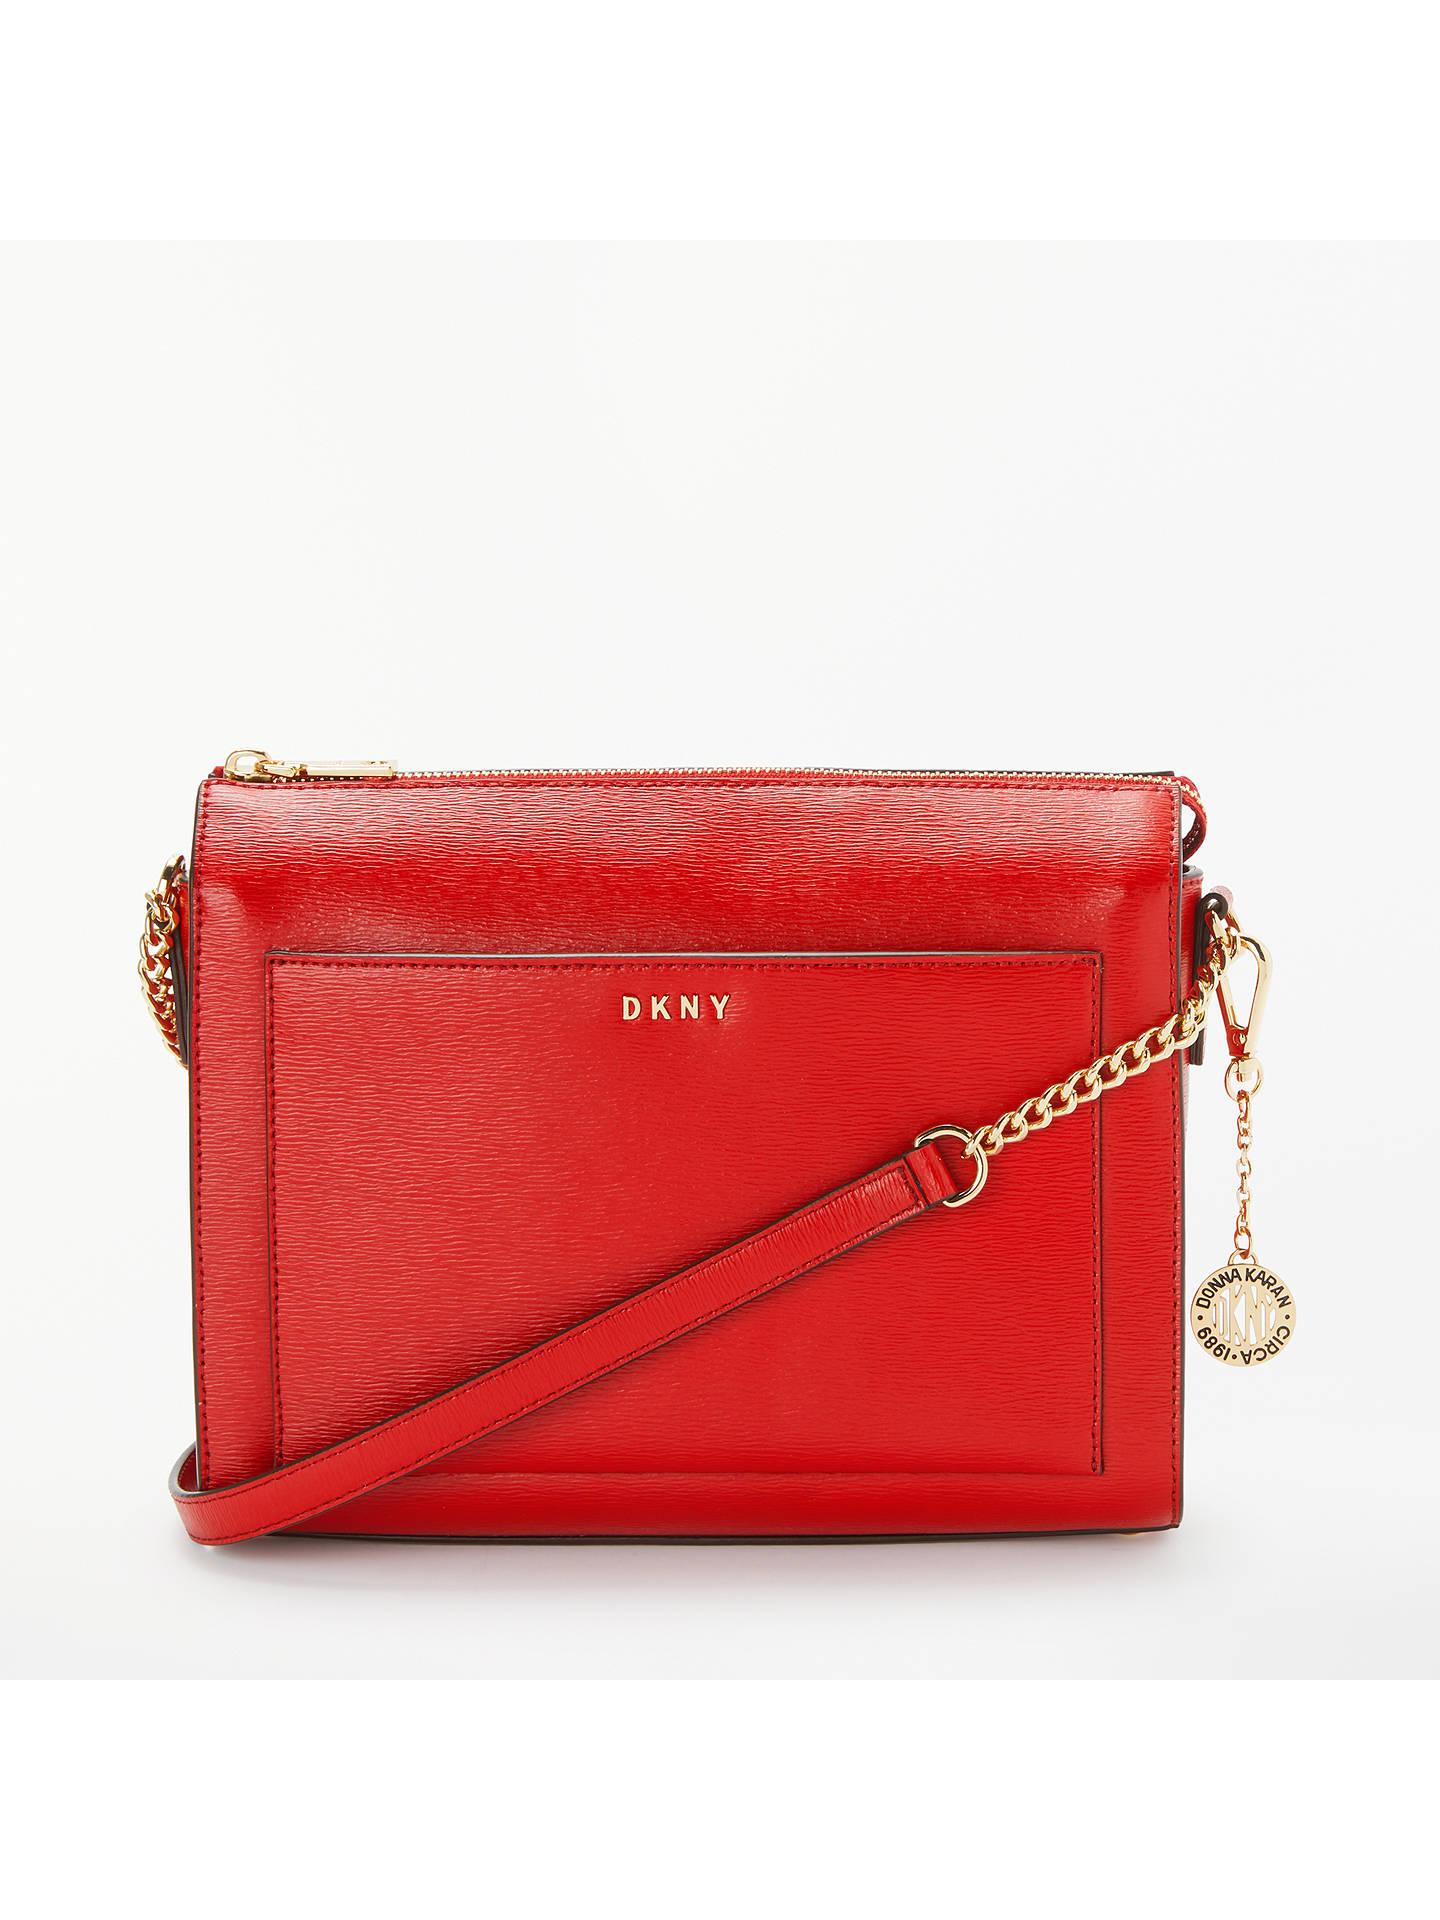 Dkny Bryant Medium Leather Box Cross Body Bag Safari Red Online At Johnlewis